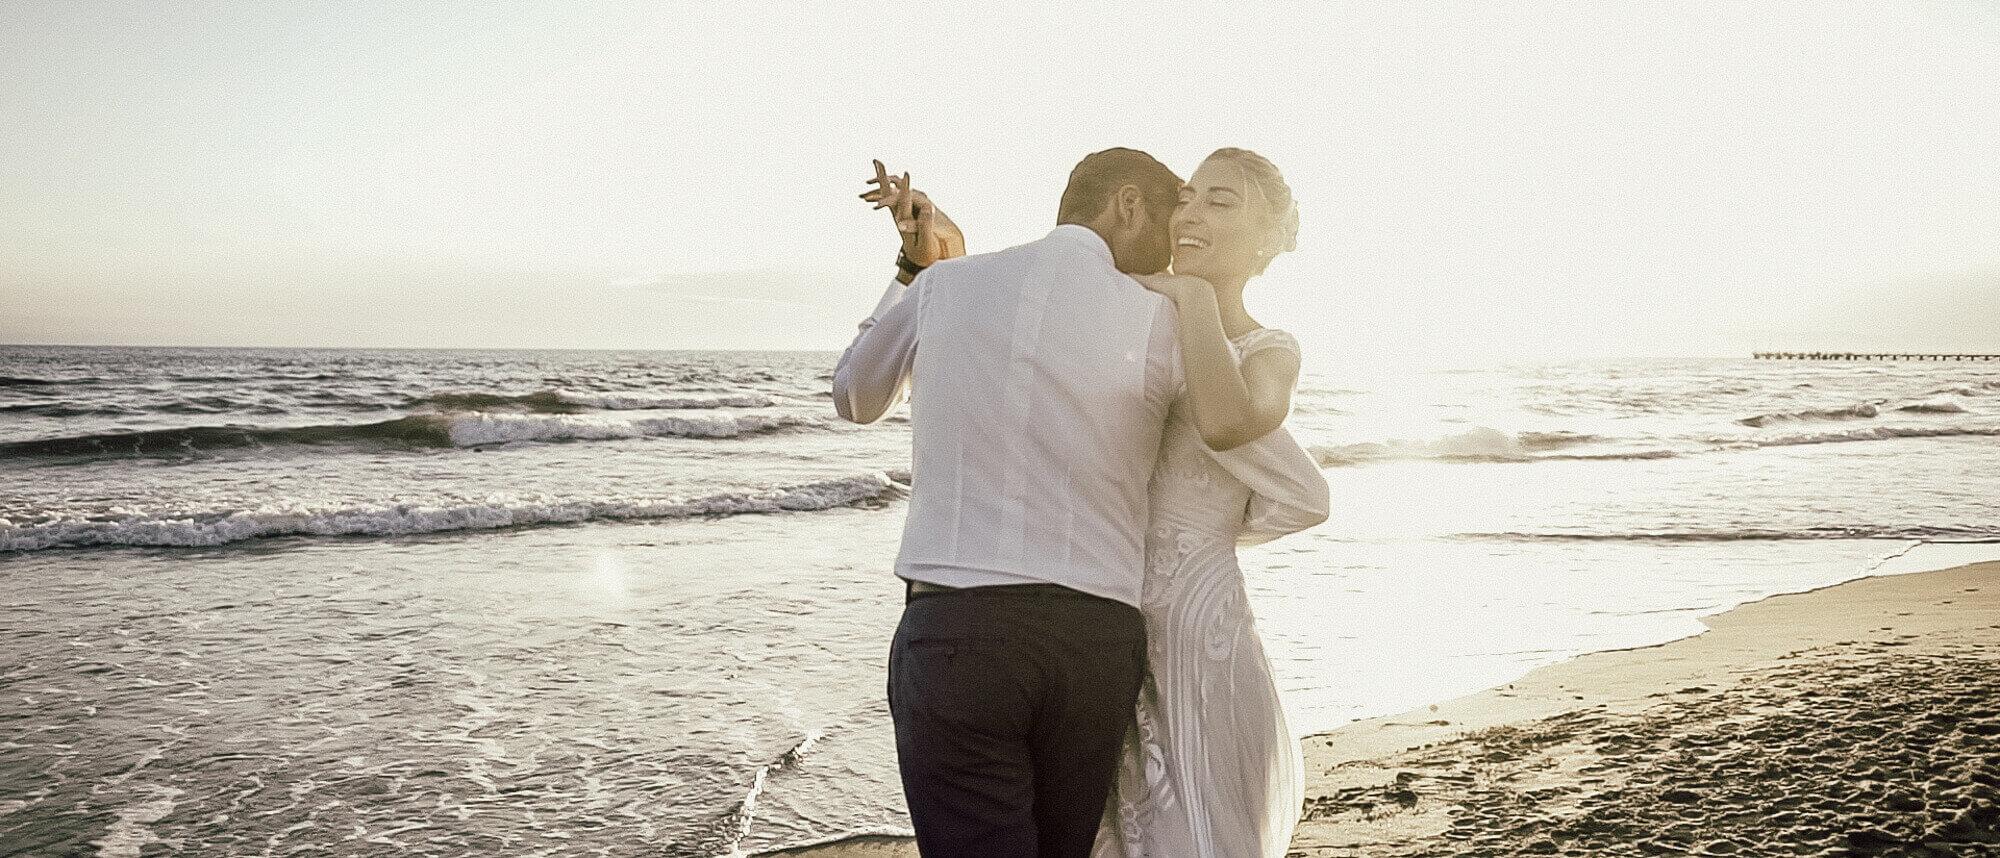 Matrimonio In Spiaggia Forte Dei Marmi : Matrimonio in spiaggia versilia al tramonto matrimonio in toscana